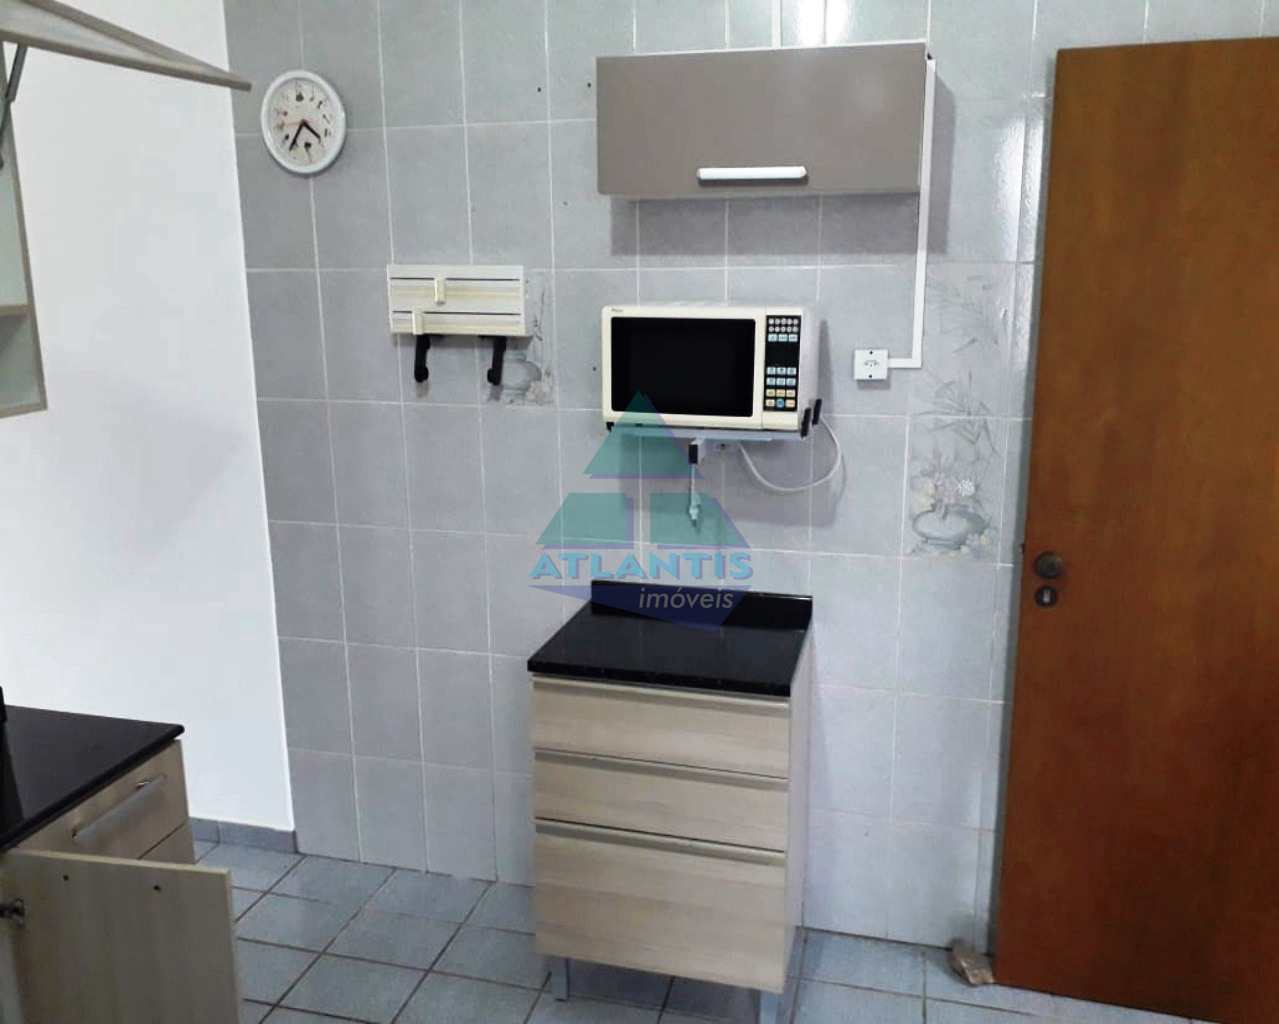 Casa de Condomínio com 2 dorms, Praia da Maranduba, Ubatuba - R$ 320 mil, Cod: 1342